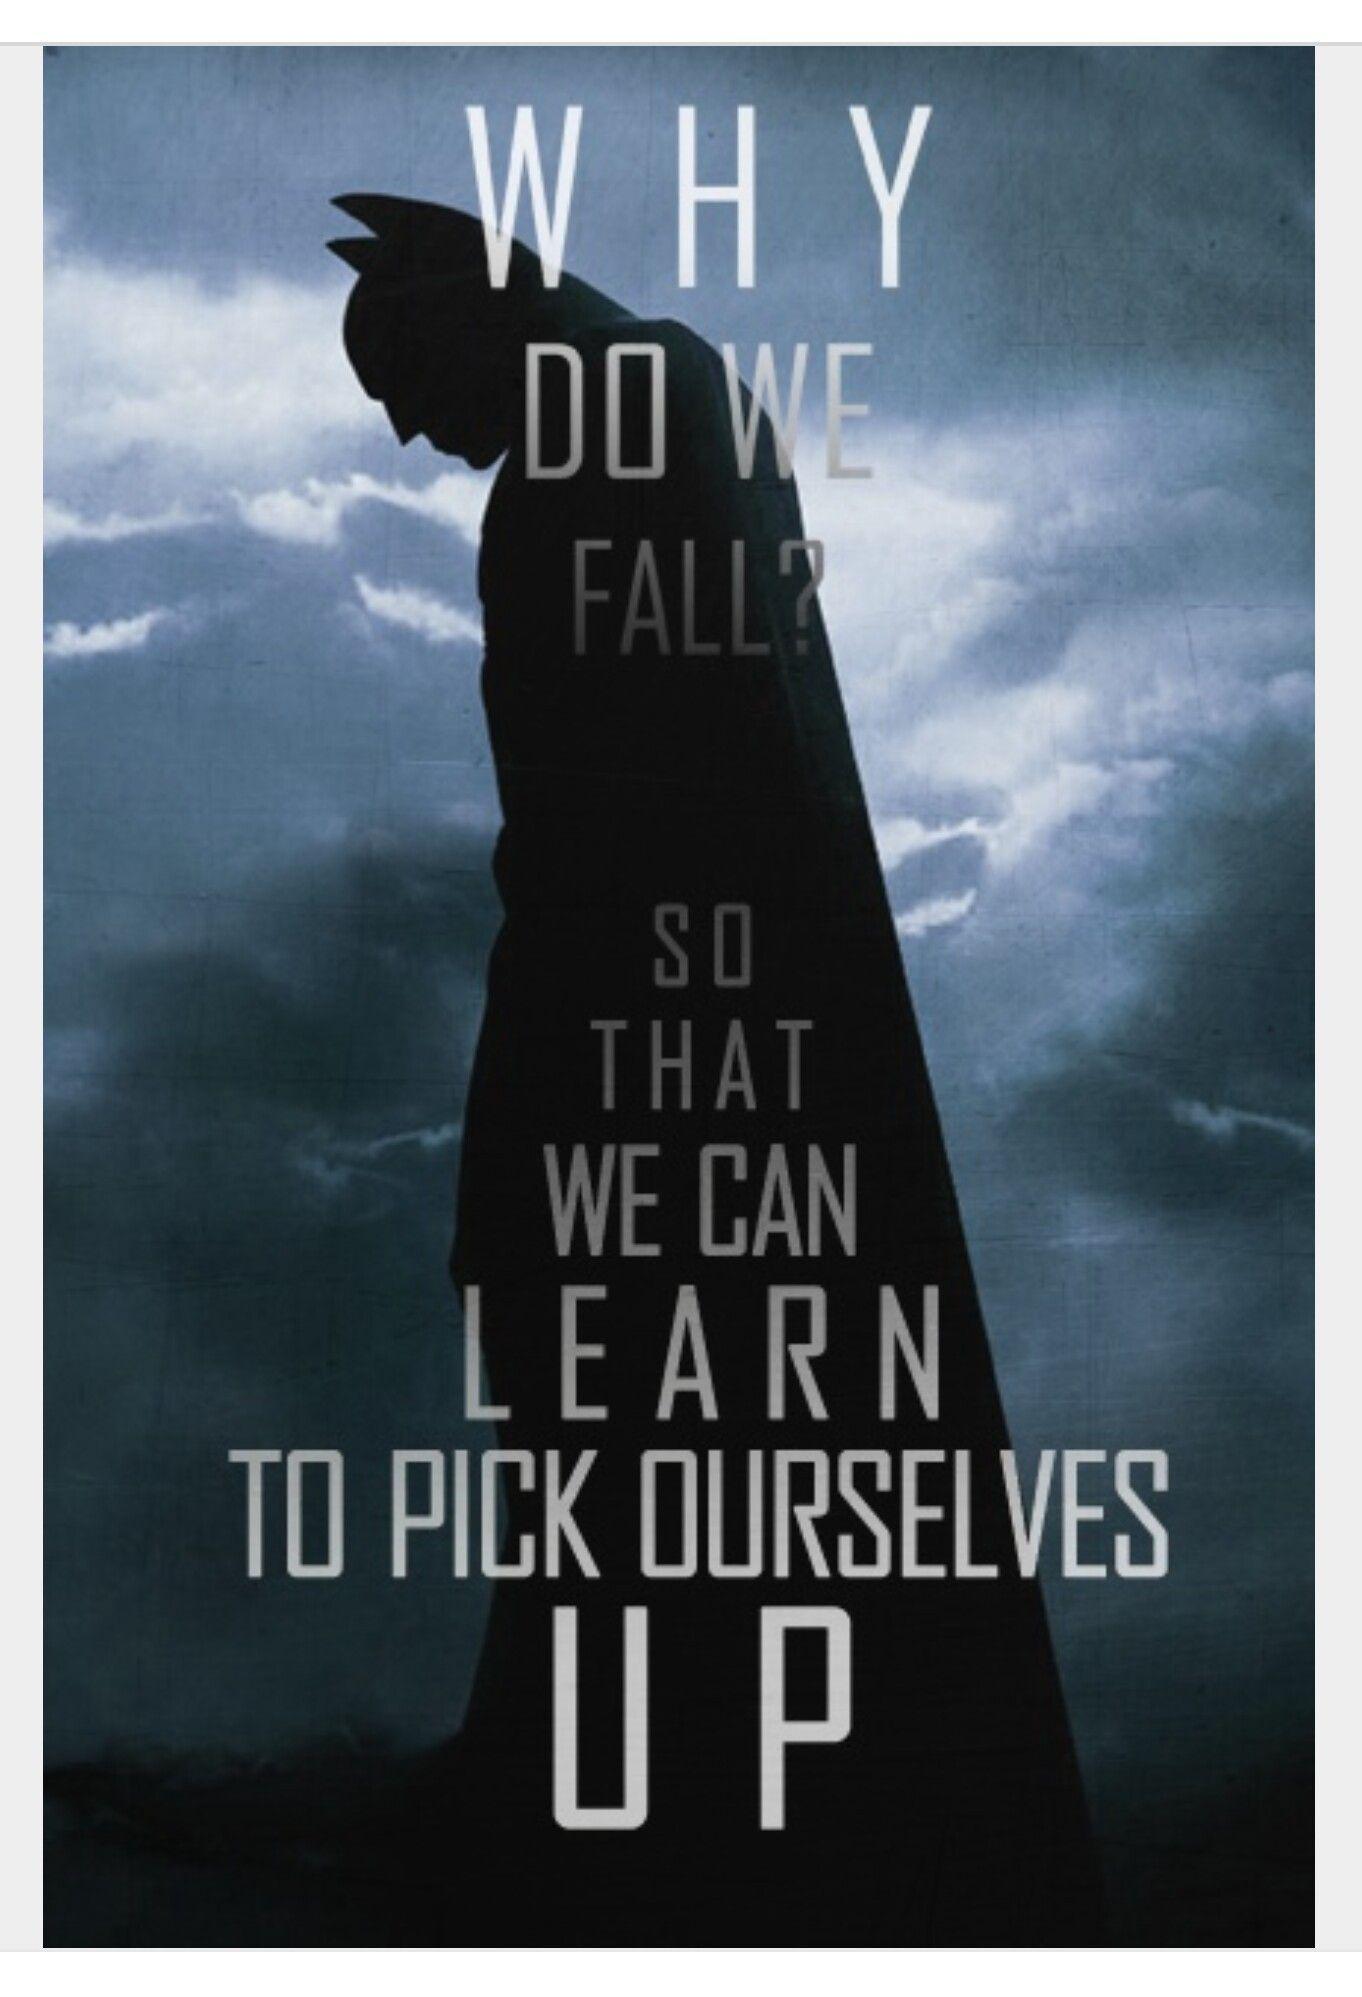 Why Do We Fall Bruce Wallpaper Pin By James Choo On Batman Pinterest Batman Batman